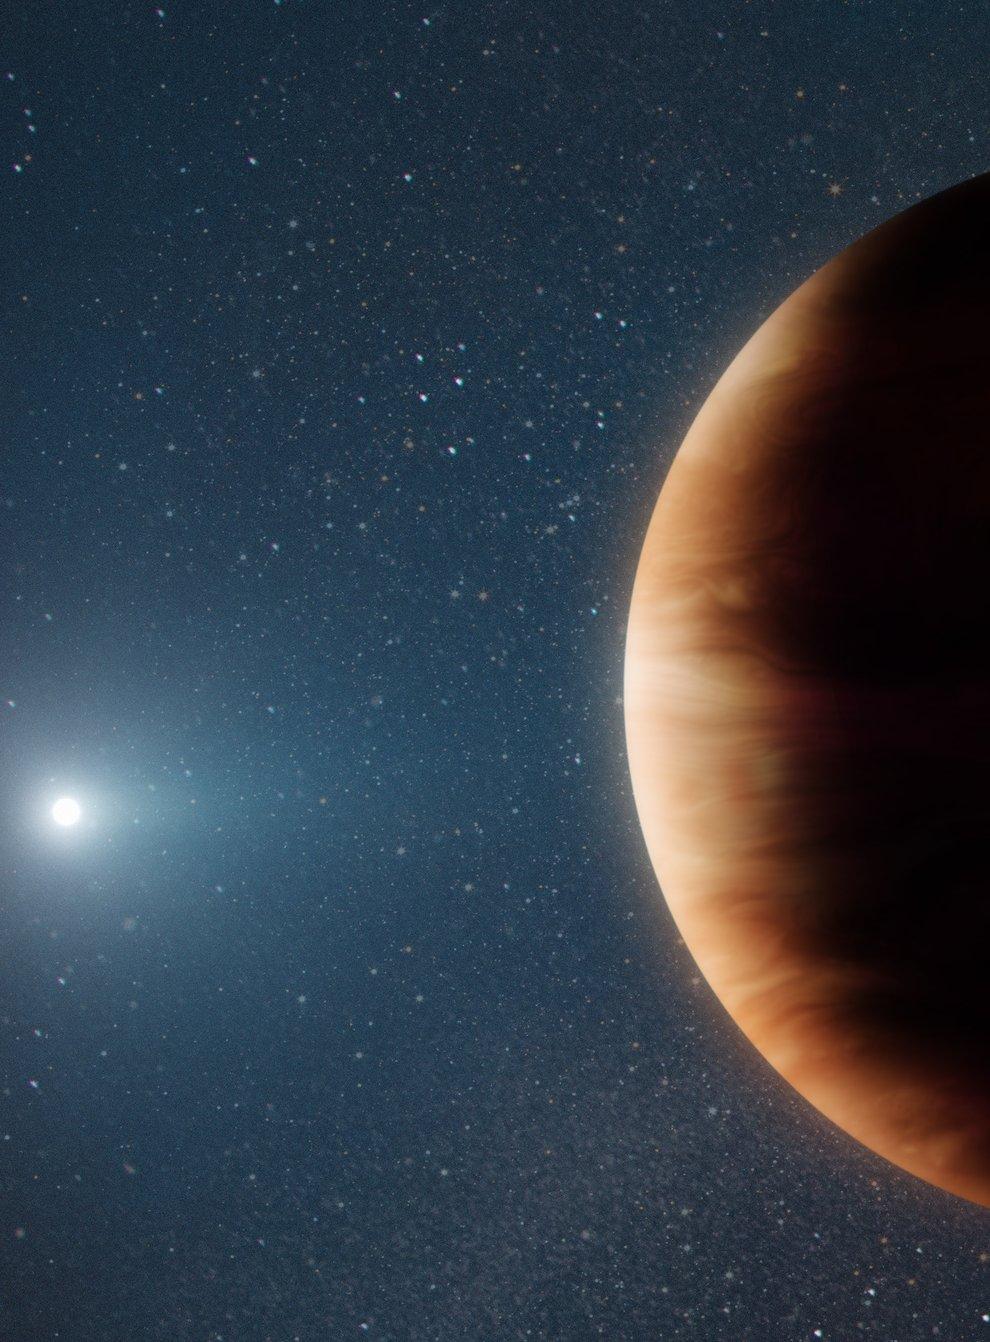 New gas giant planet found orbiting white dwarf star (W M Keck Observatory/Adam Makarenko)